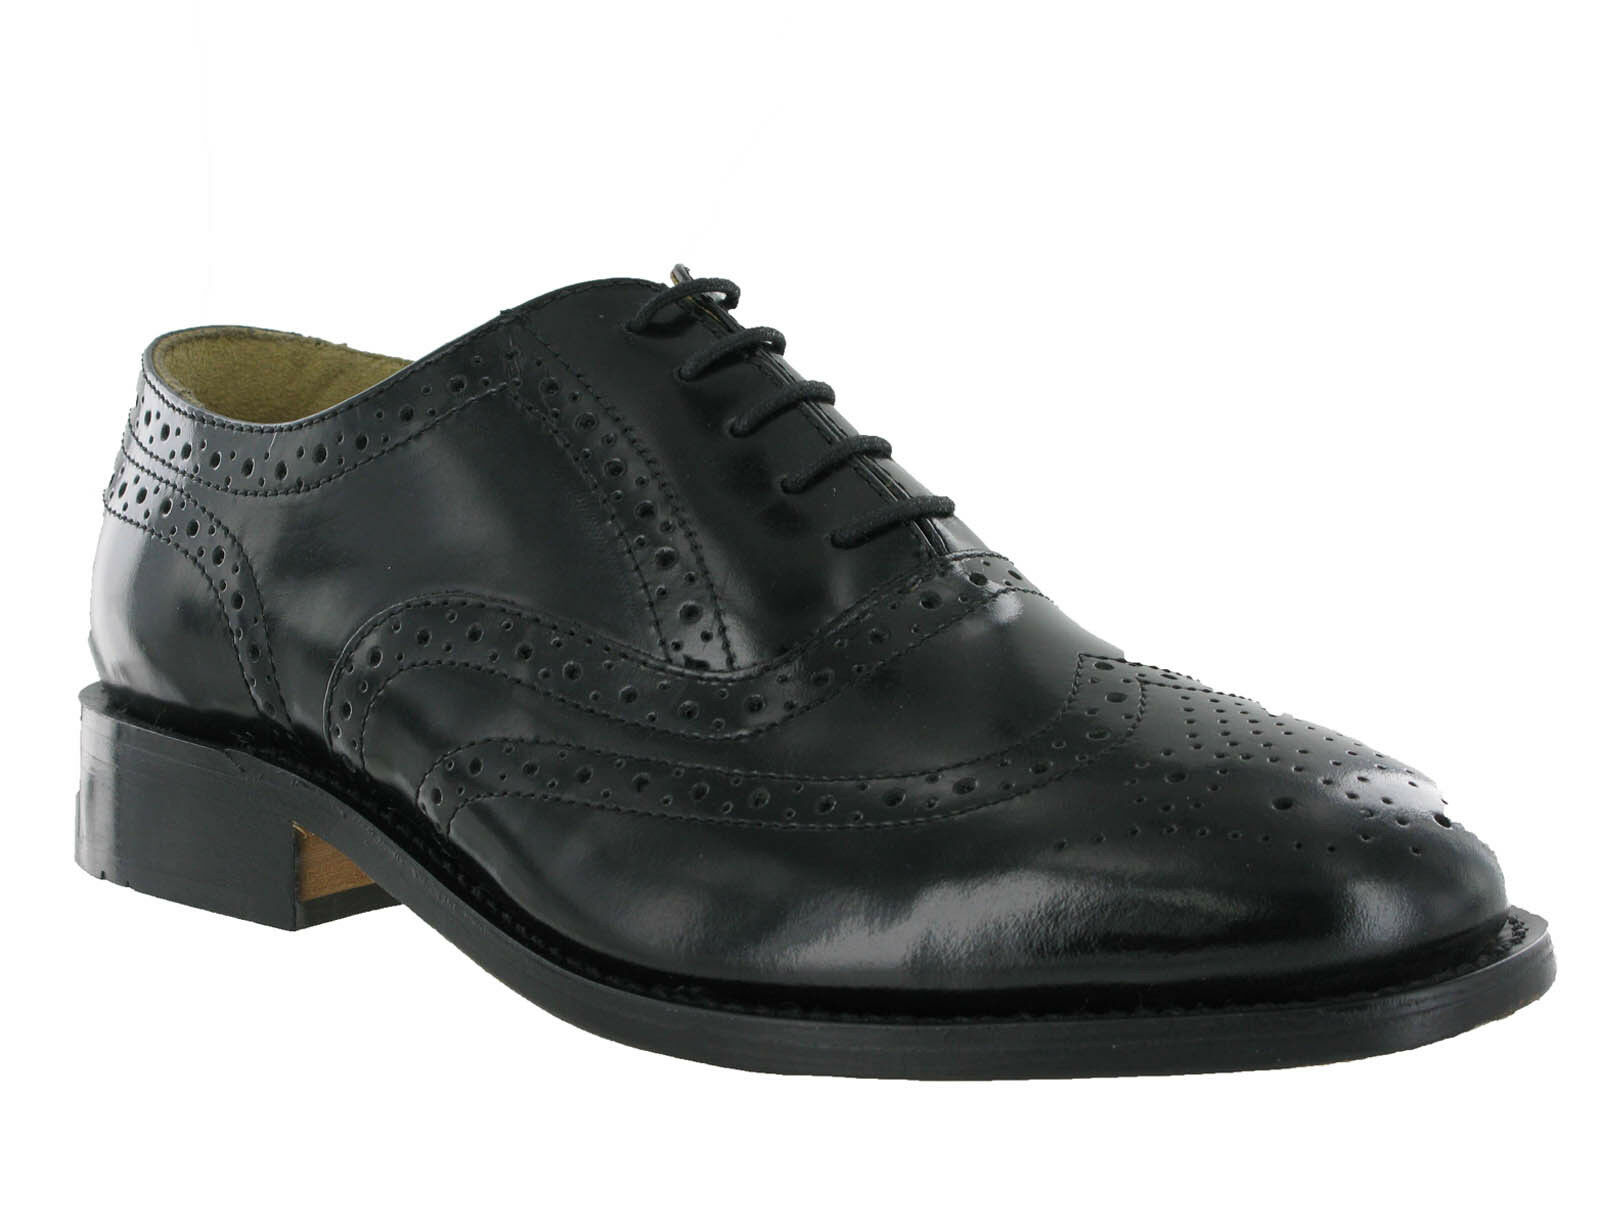 LEATHER BLACK ... KENSINGTON BROGUE FORMAL SMART Schuhe WEDDING Herren ... BLACK 60b54d